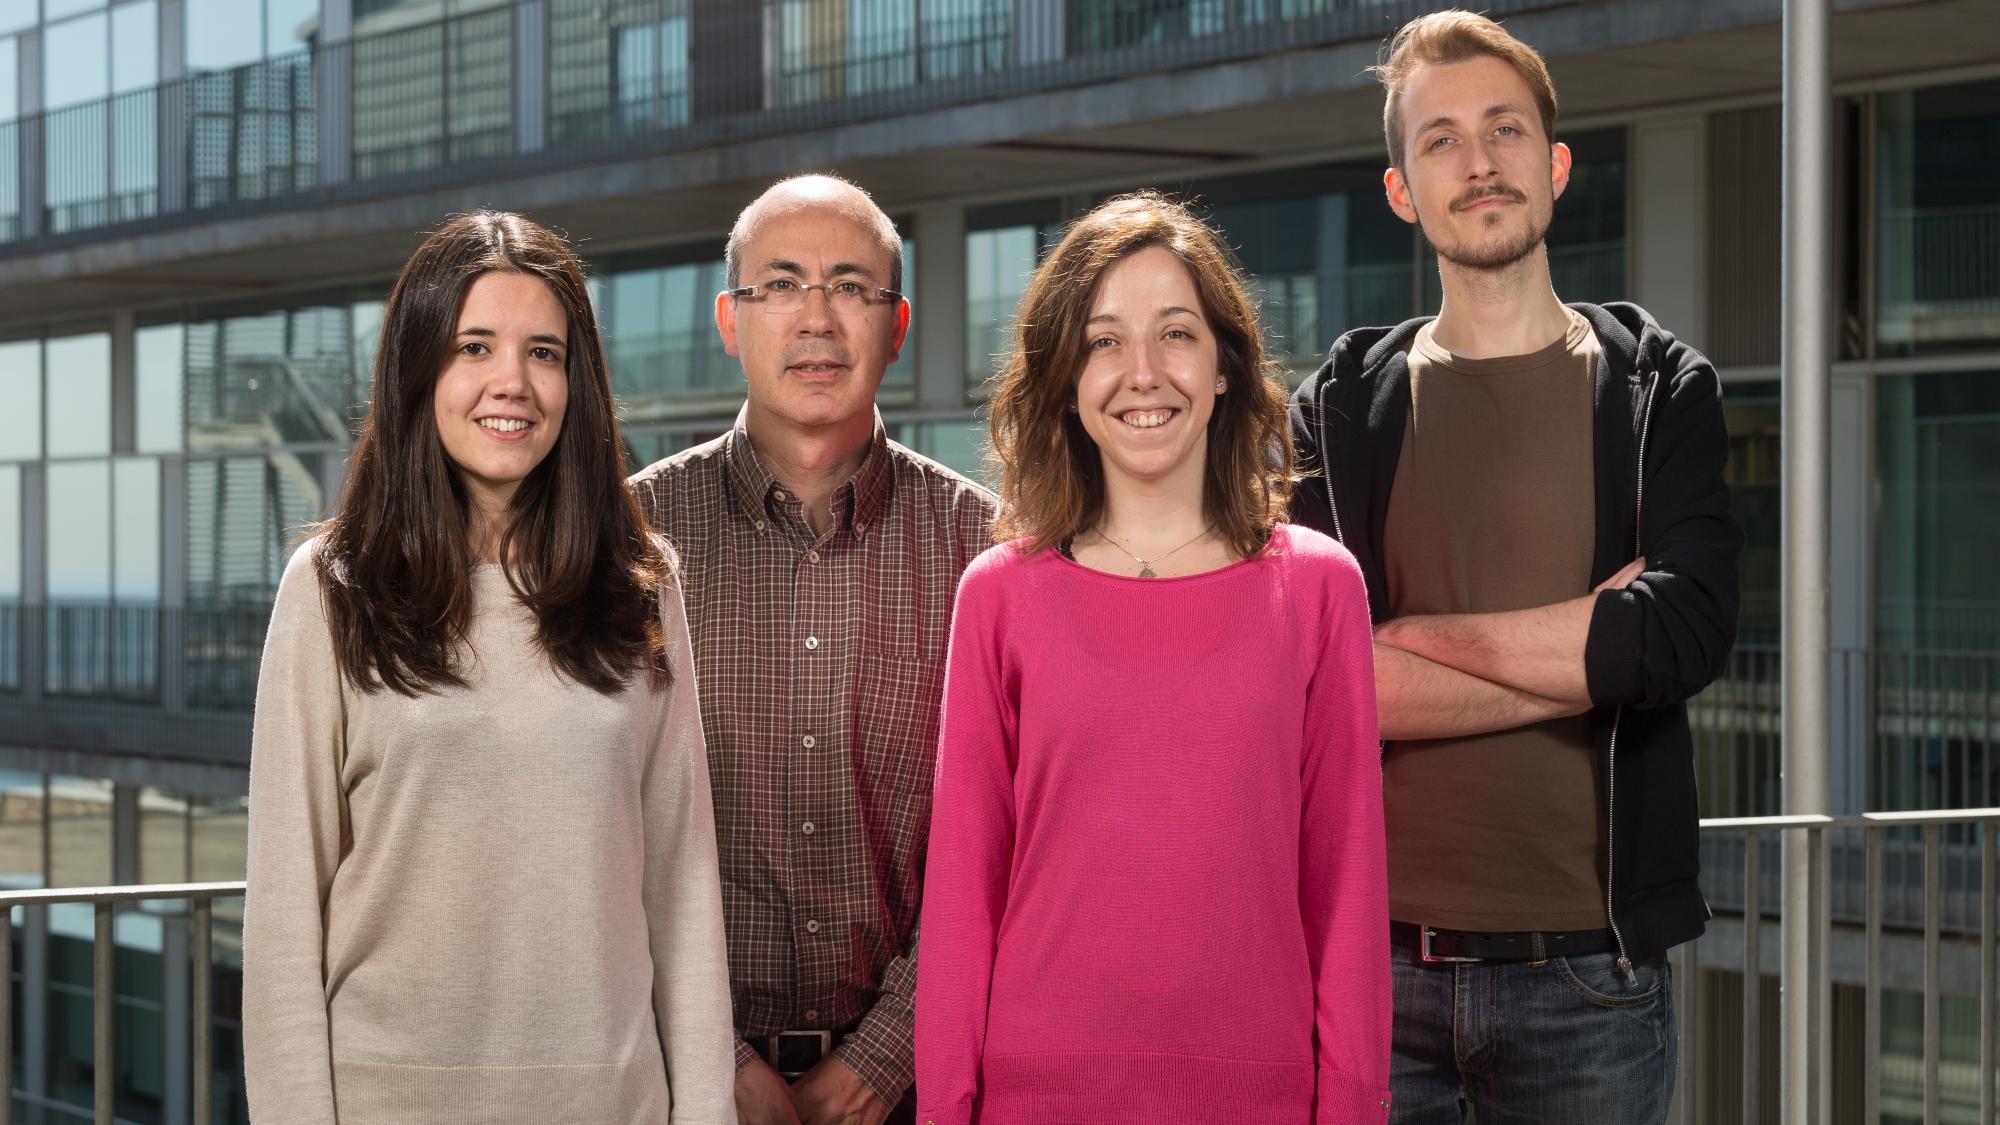 Members of the Genomics of Individuality laboratory.